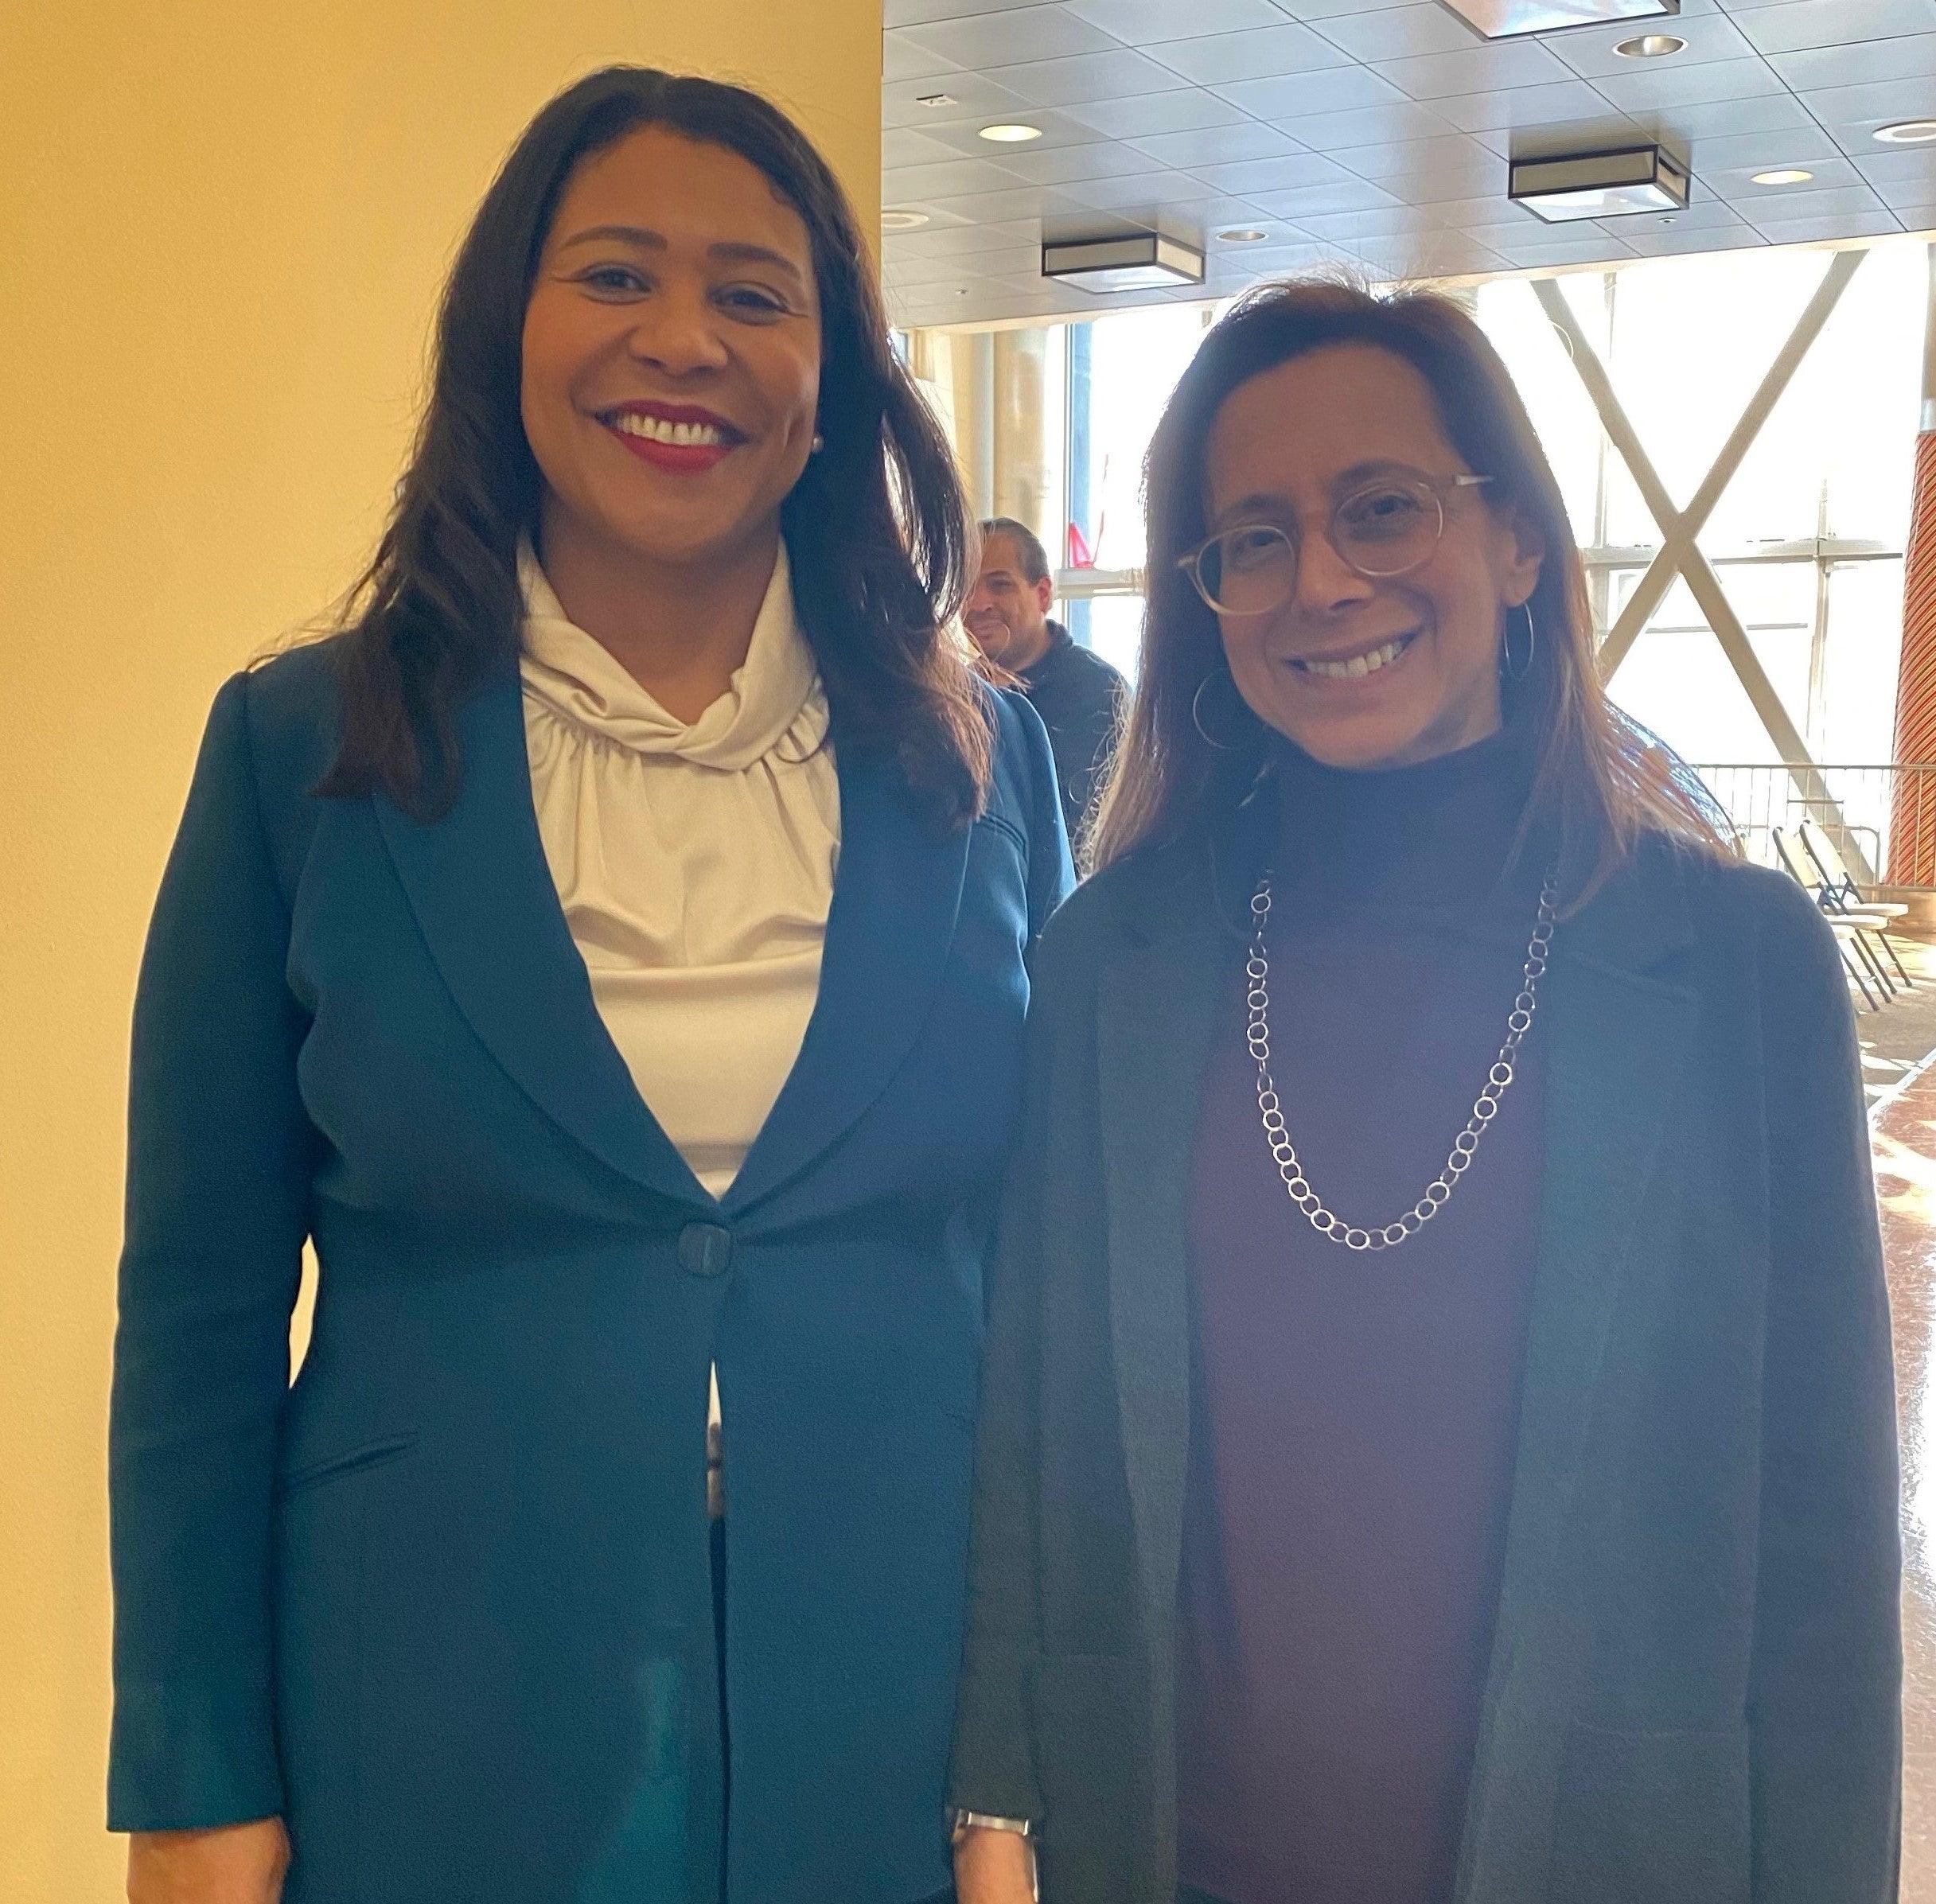 Mayor Breed and Katy Miller, San Francisco's new Juvenile Probation Officer